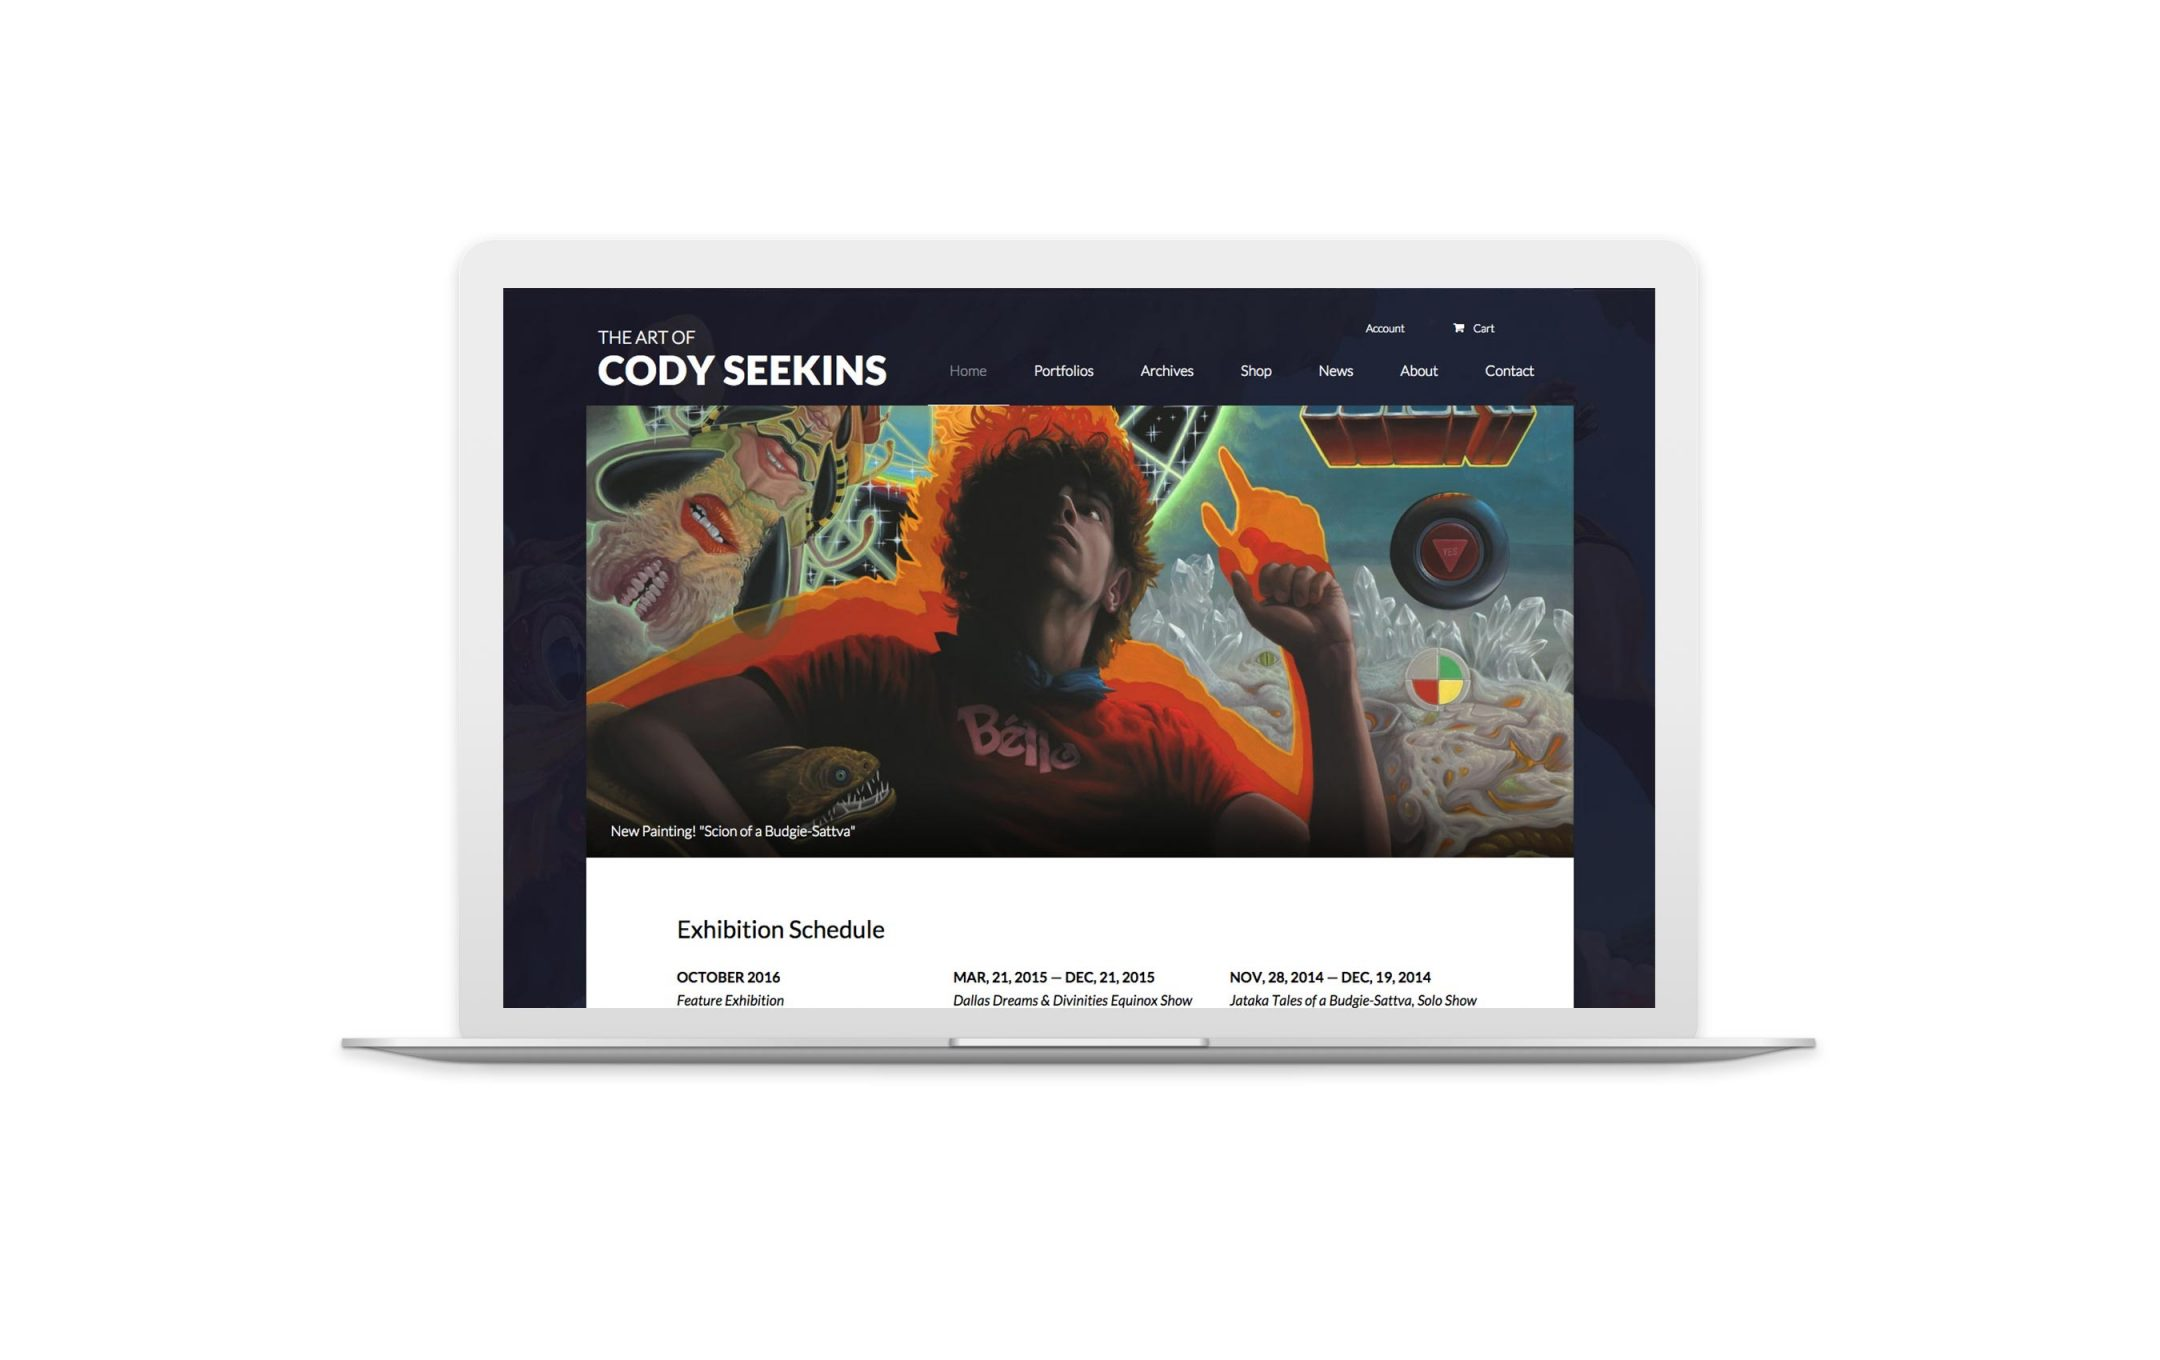 codyseekins.com home page design